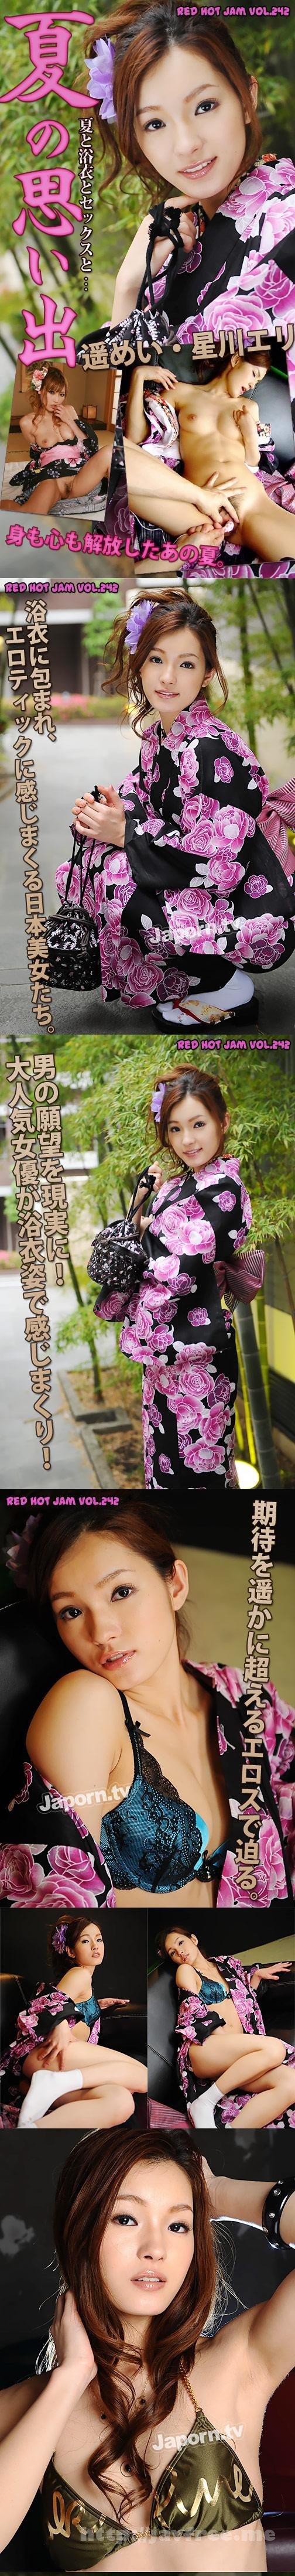 [HD][DVD][RHJ-242] Red Hot Jam Vol.242 ~ Memories of Summer ~ : Mei Haruka, Eri Hoshikawa - image RHJ-242_1 on https://javfree.me